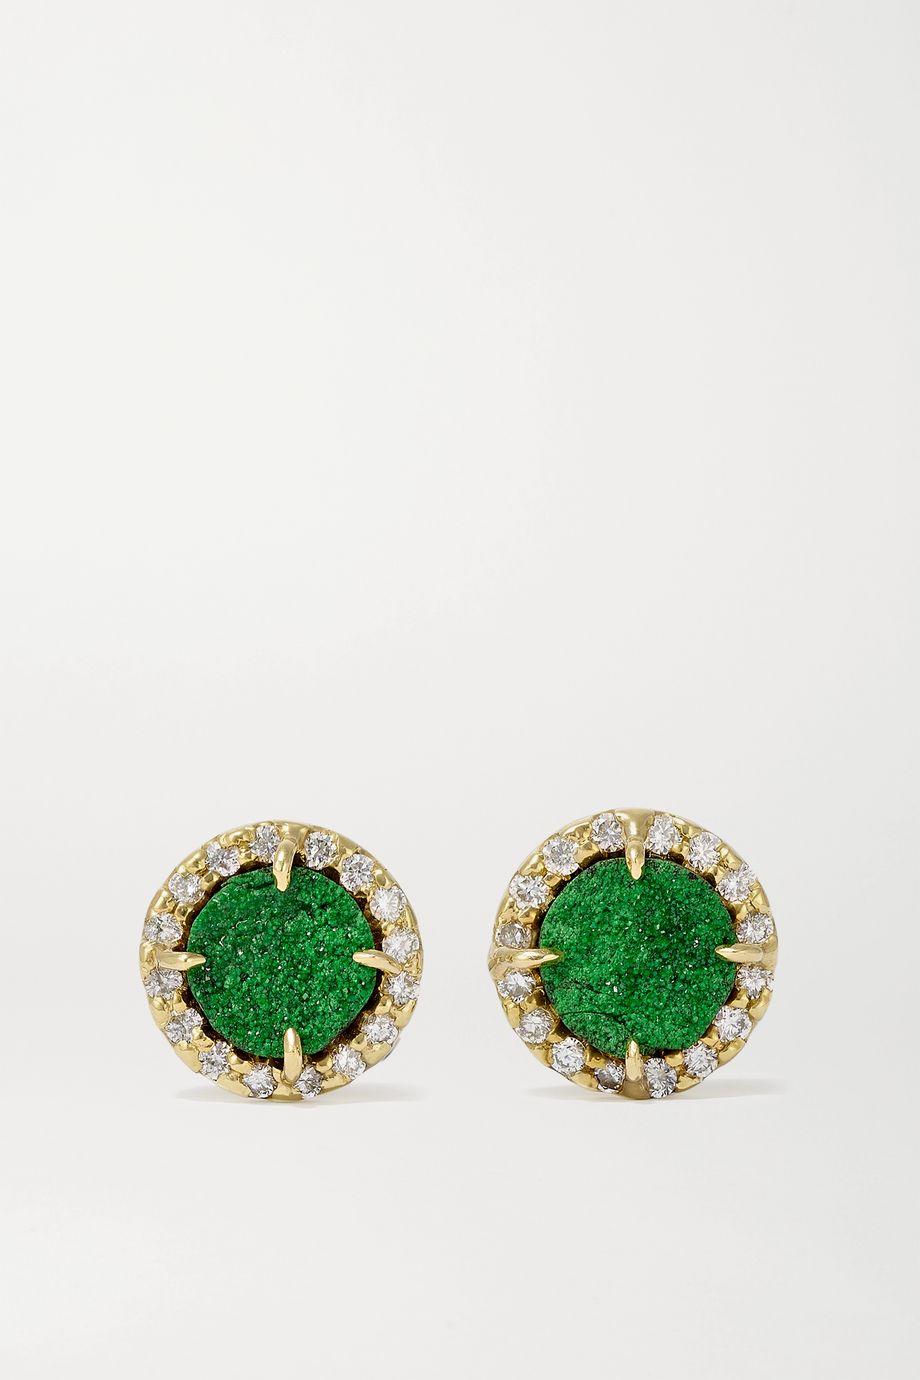 Kimberly McDonald 18-karat green gold, uvarovite garnet and diamond earrings